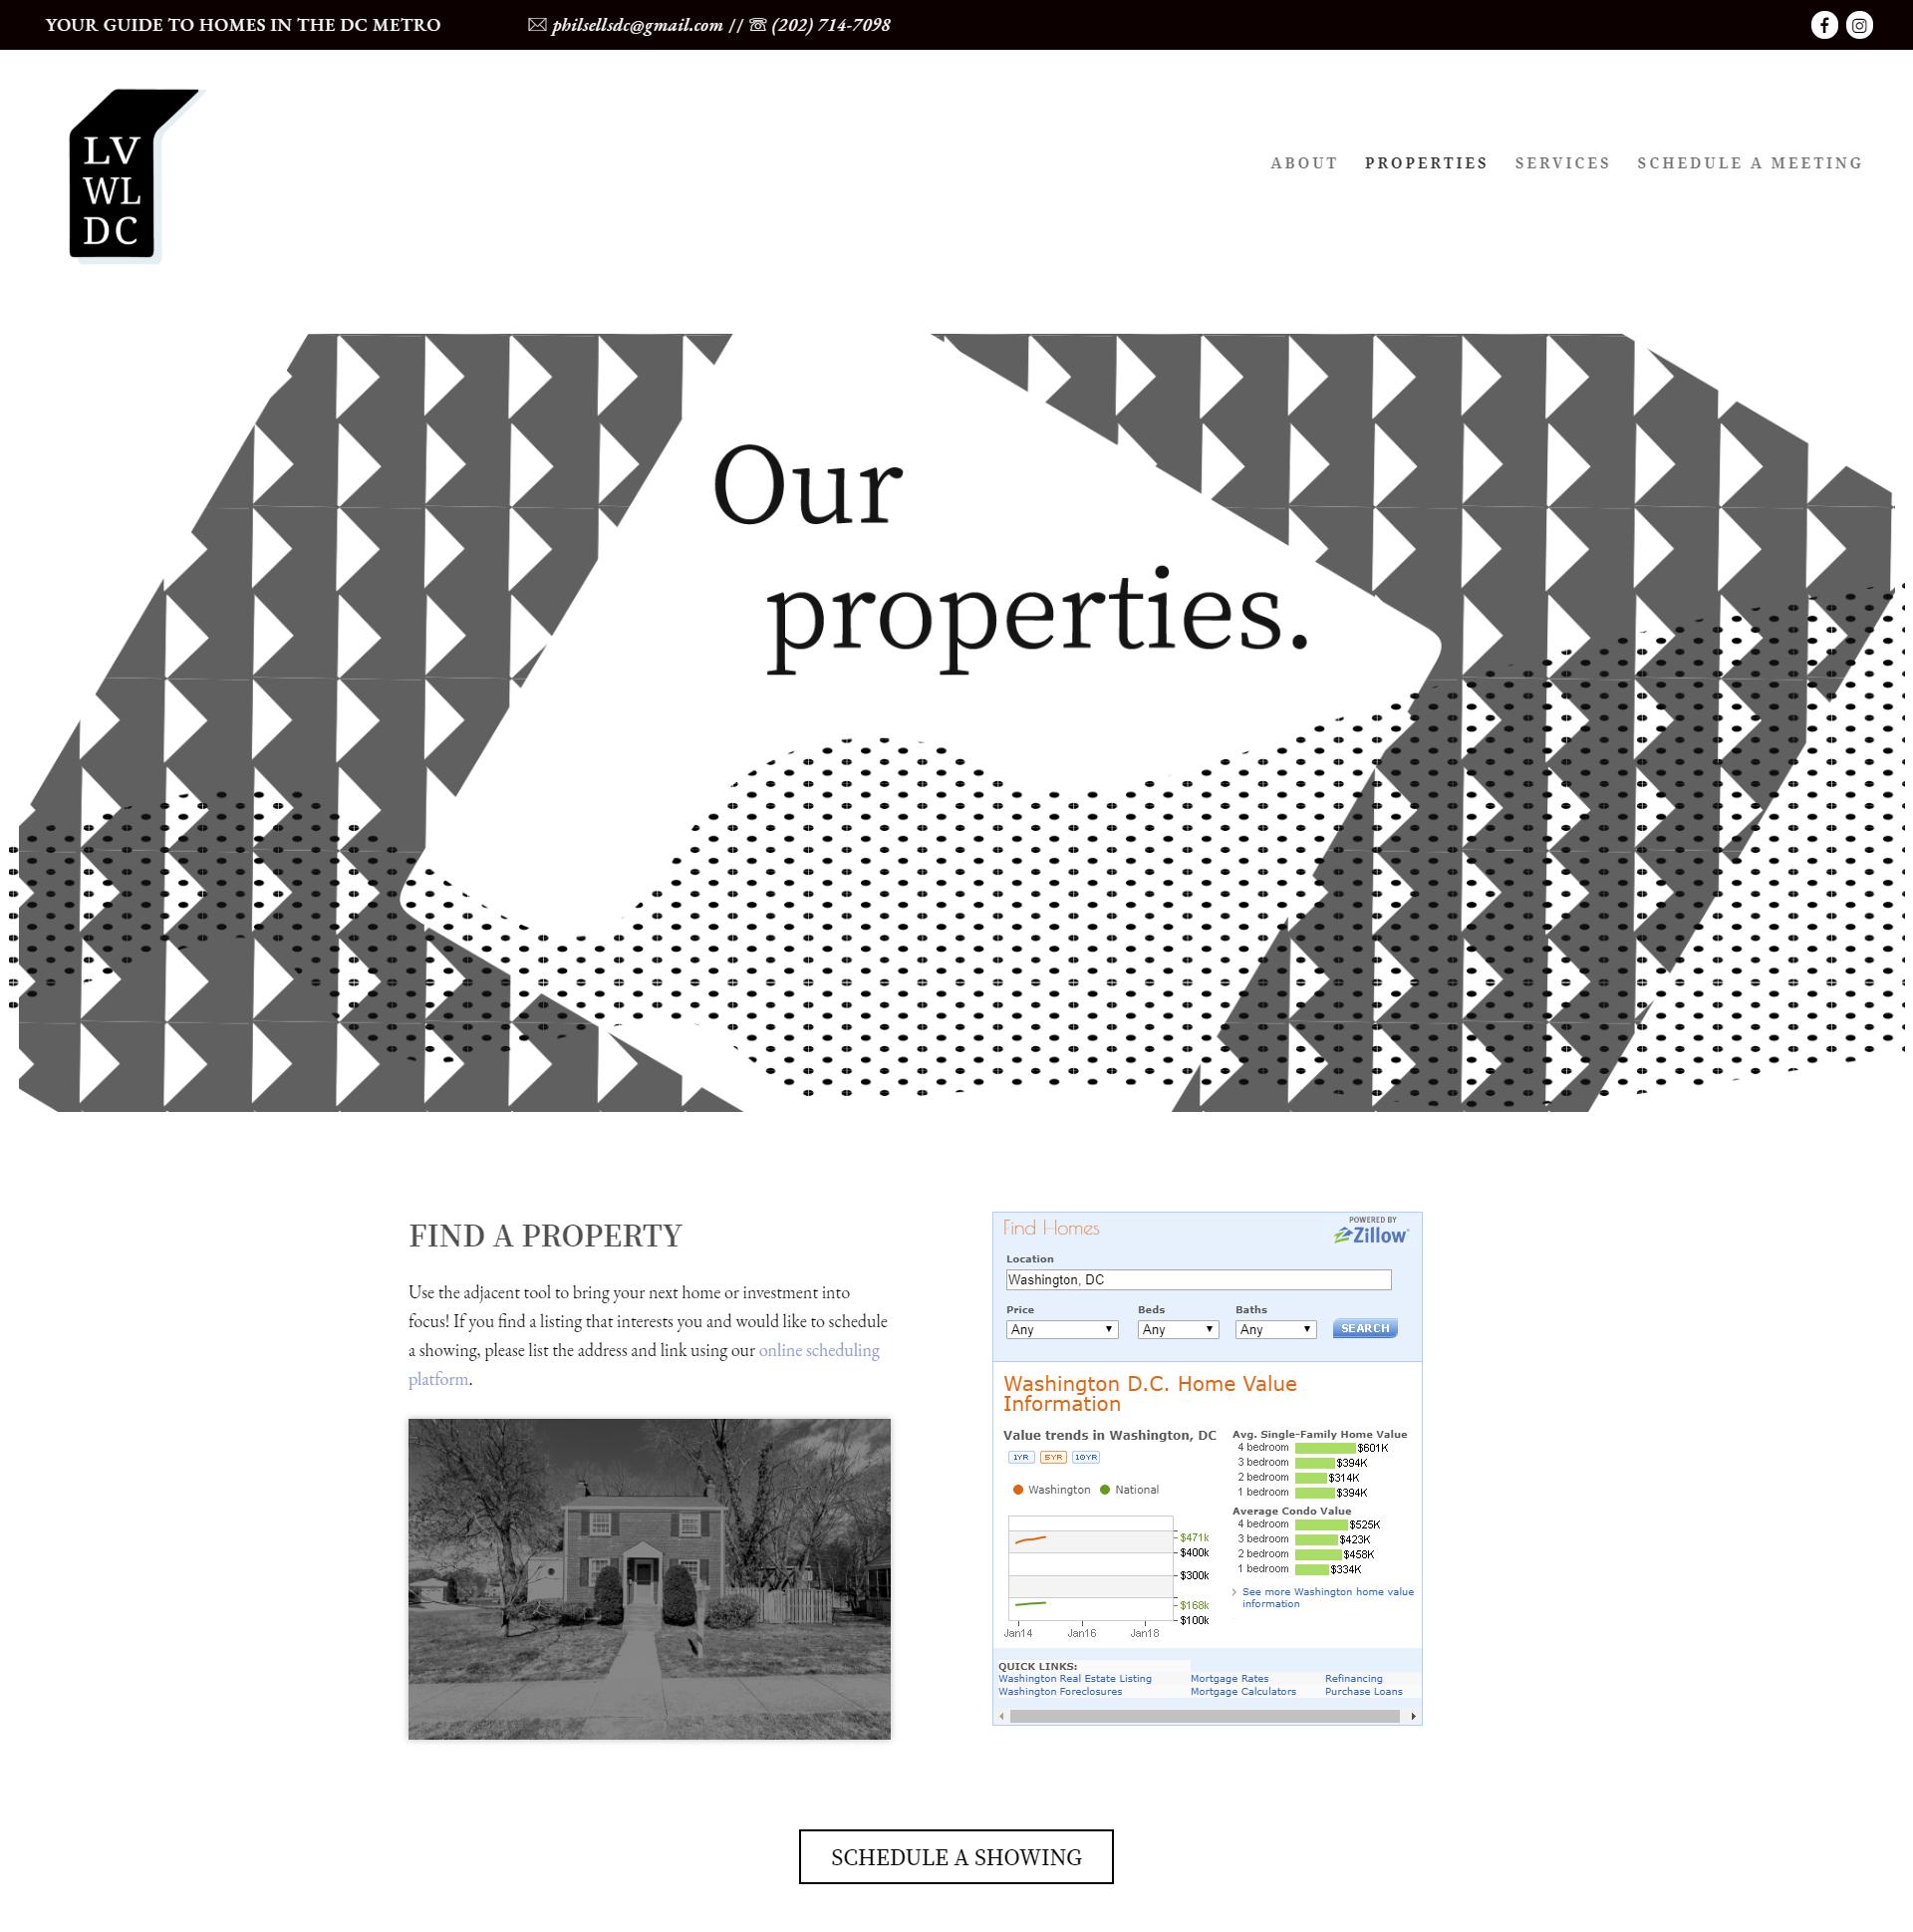 Properties-1.png